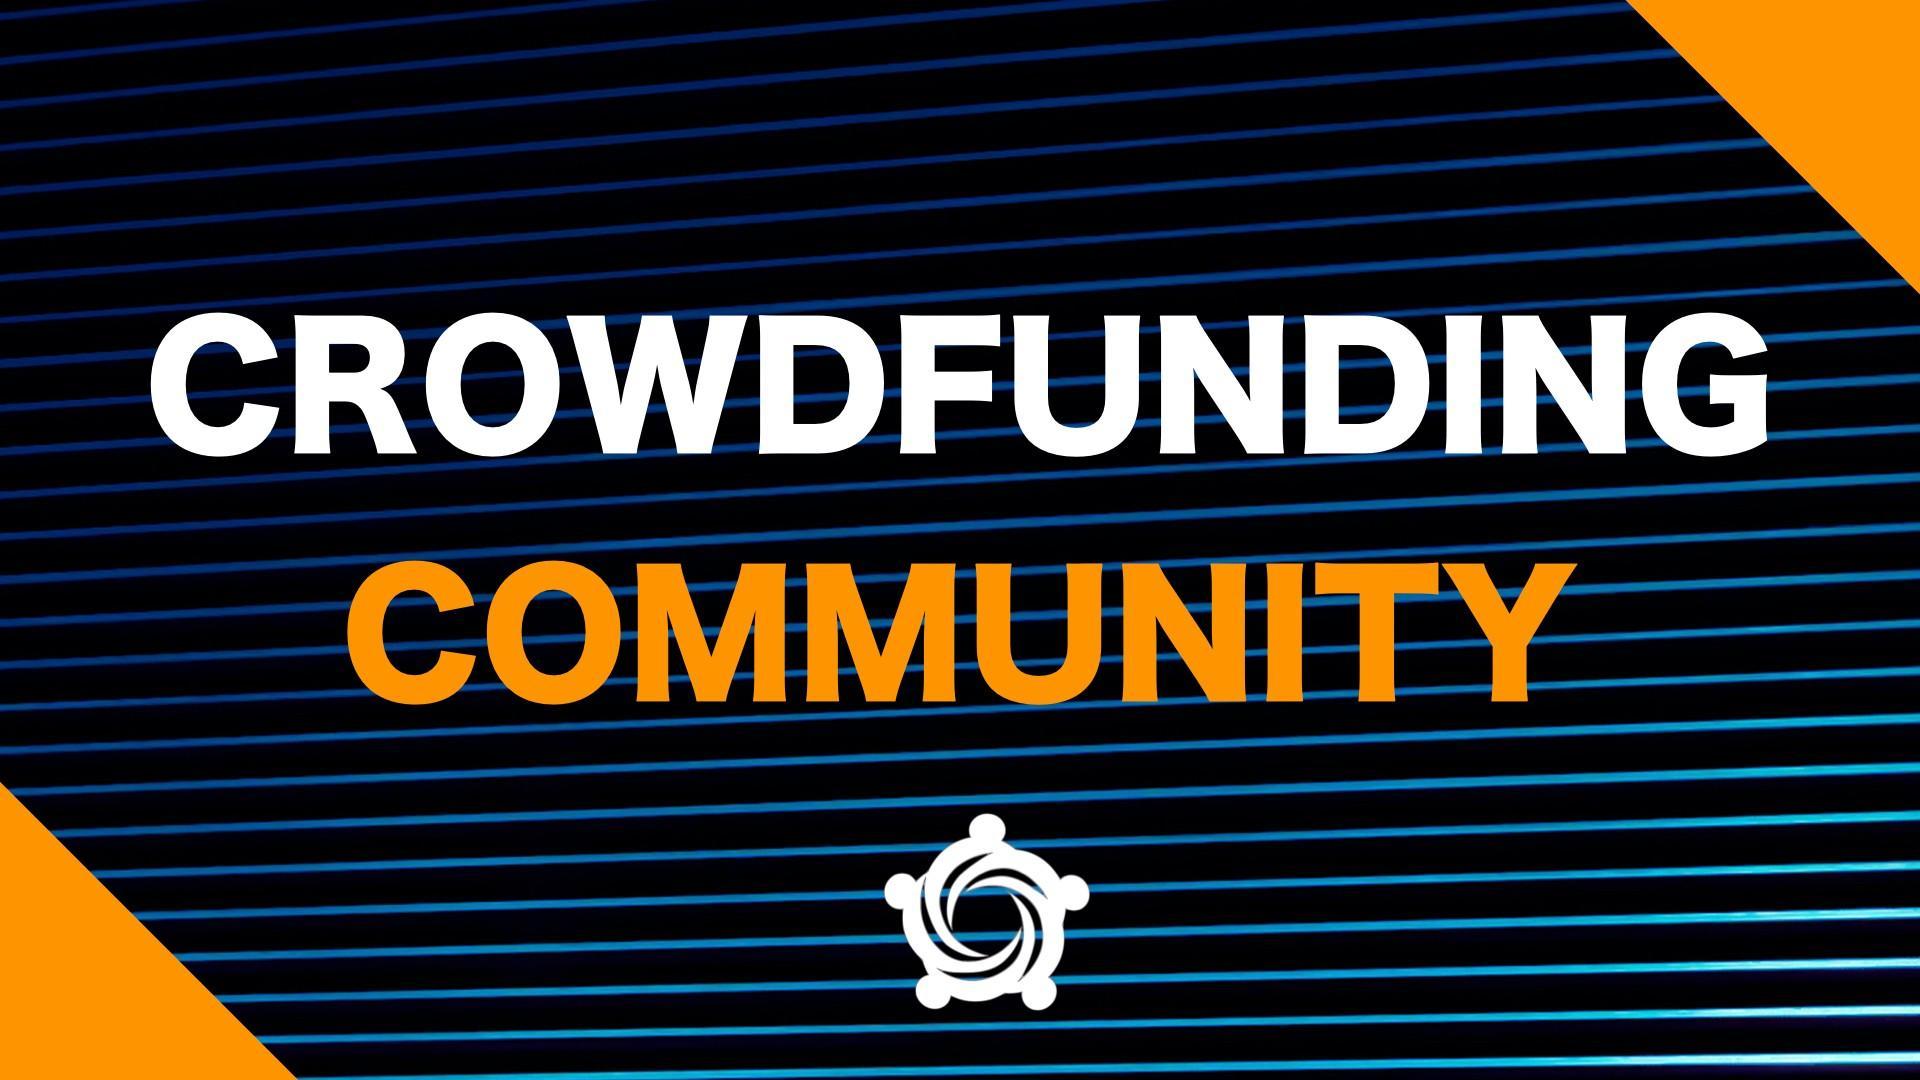 Crowdfunding Community